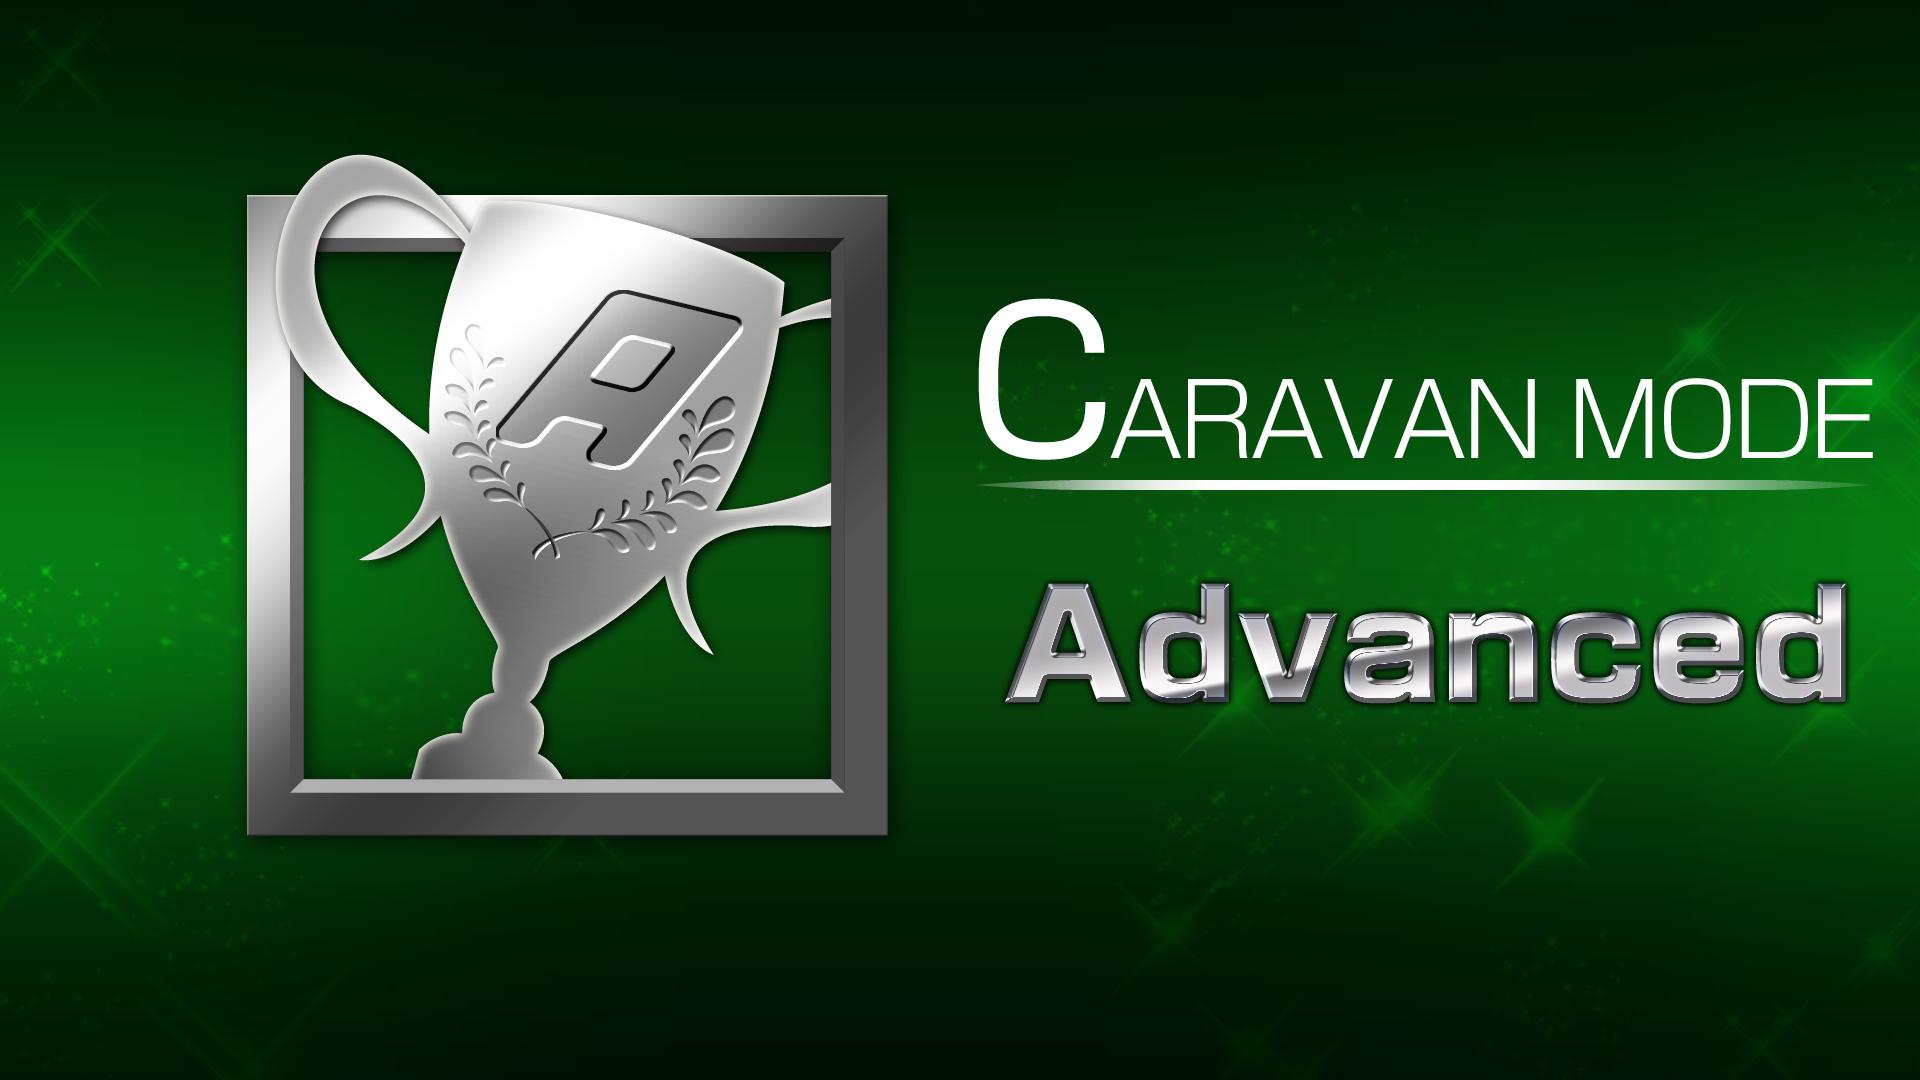 Icon for CARAVAN MODE 7,500 points